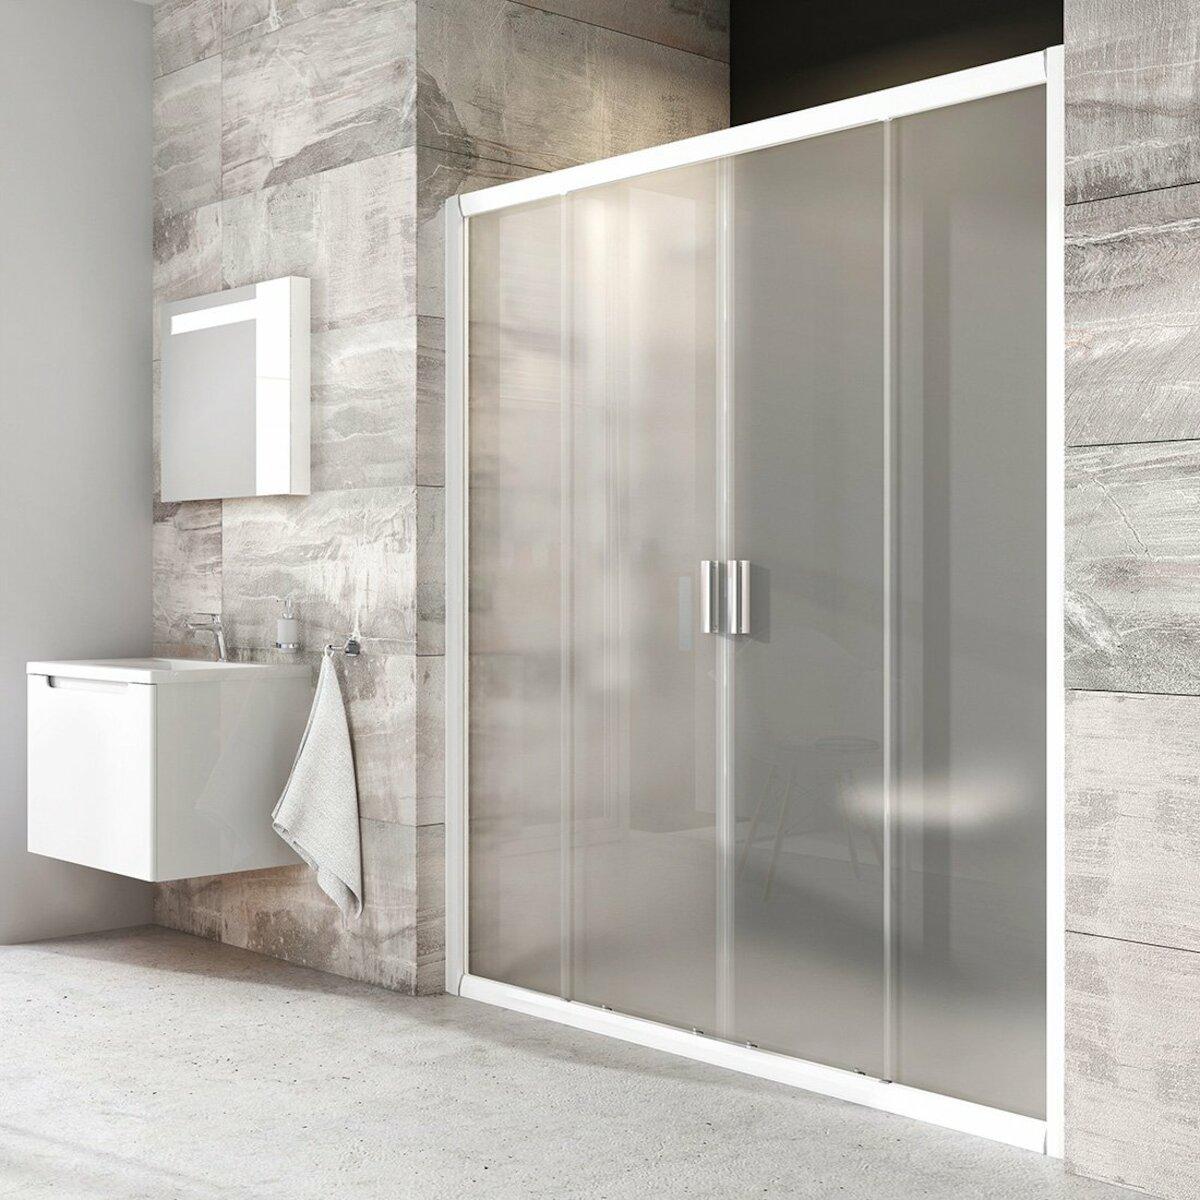 Sprchové dvere 160x190 cm Ravak Blix biela 0YVS0100ZG